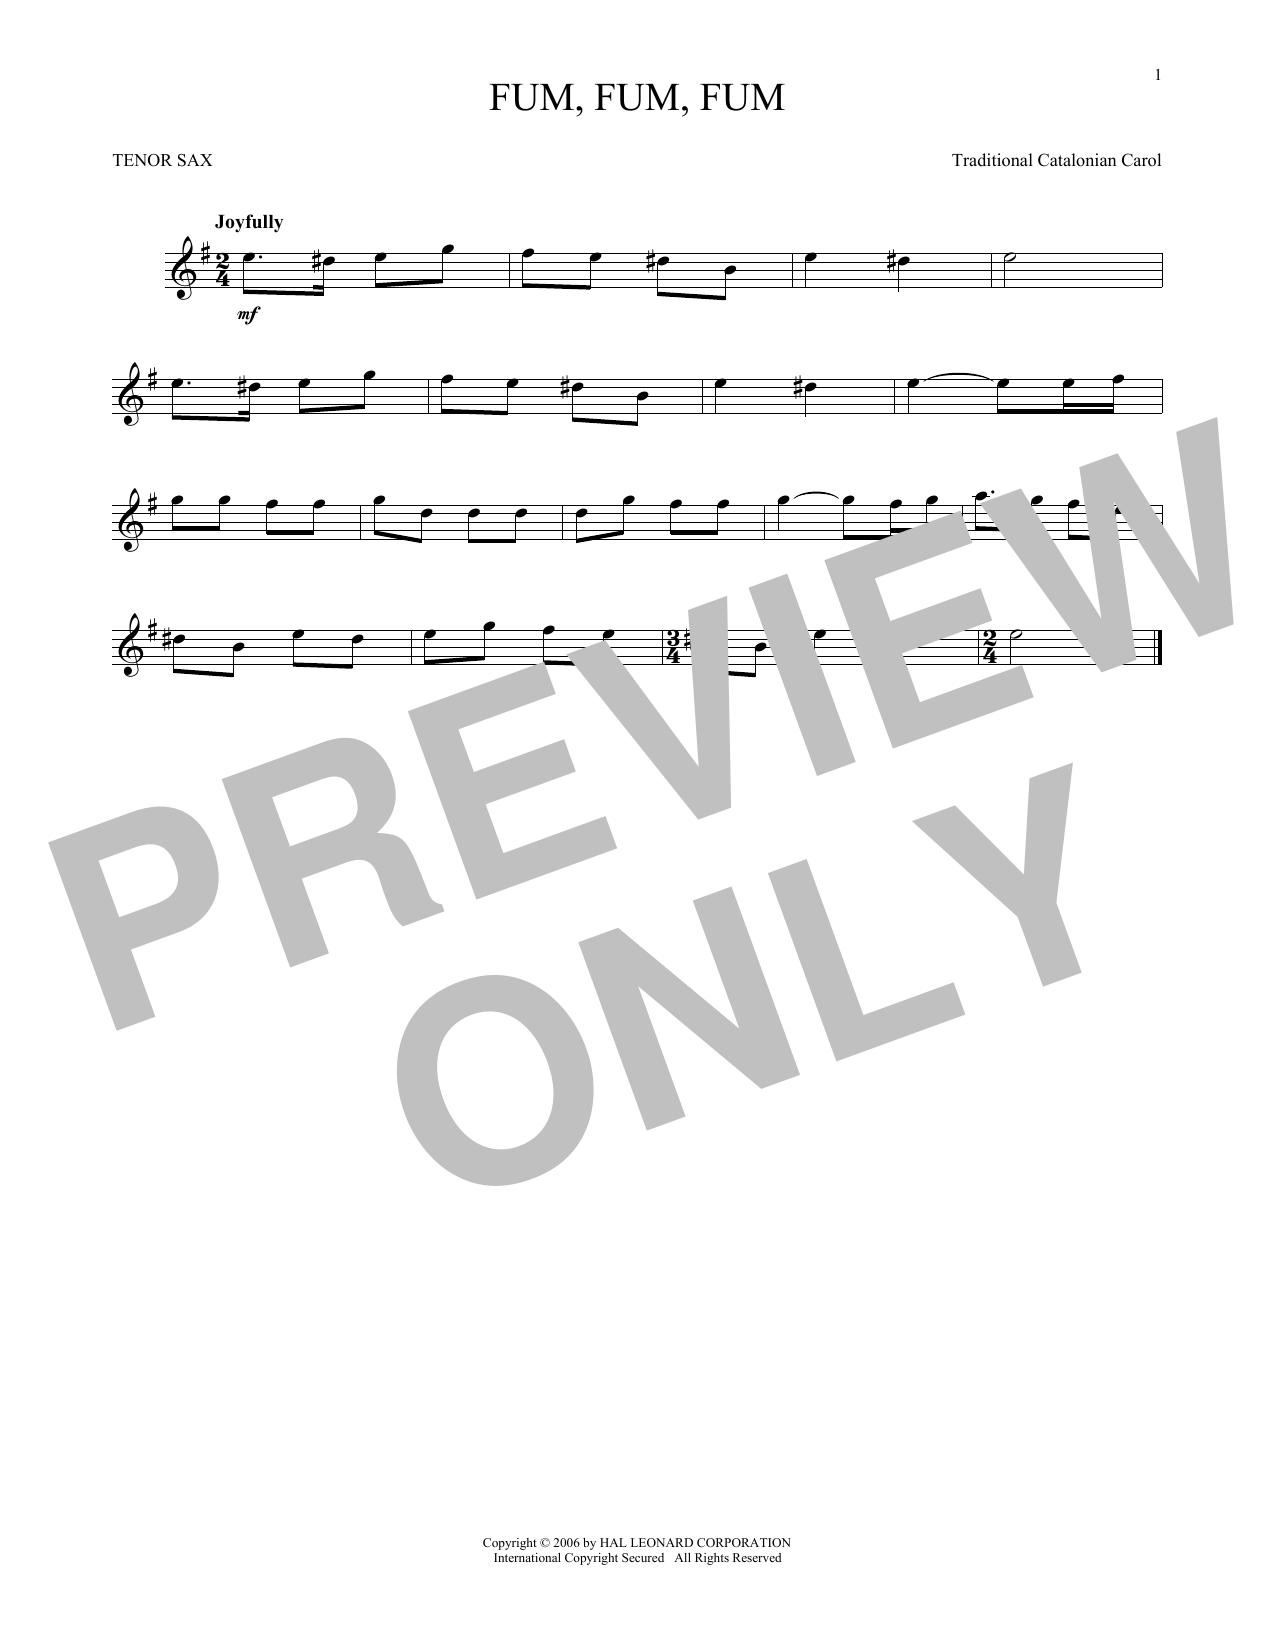 Partition saxophone Fum, Fum, Fum de Traditional Catalonian Carol - Sax Tenor